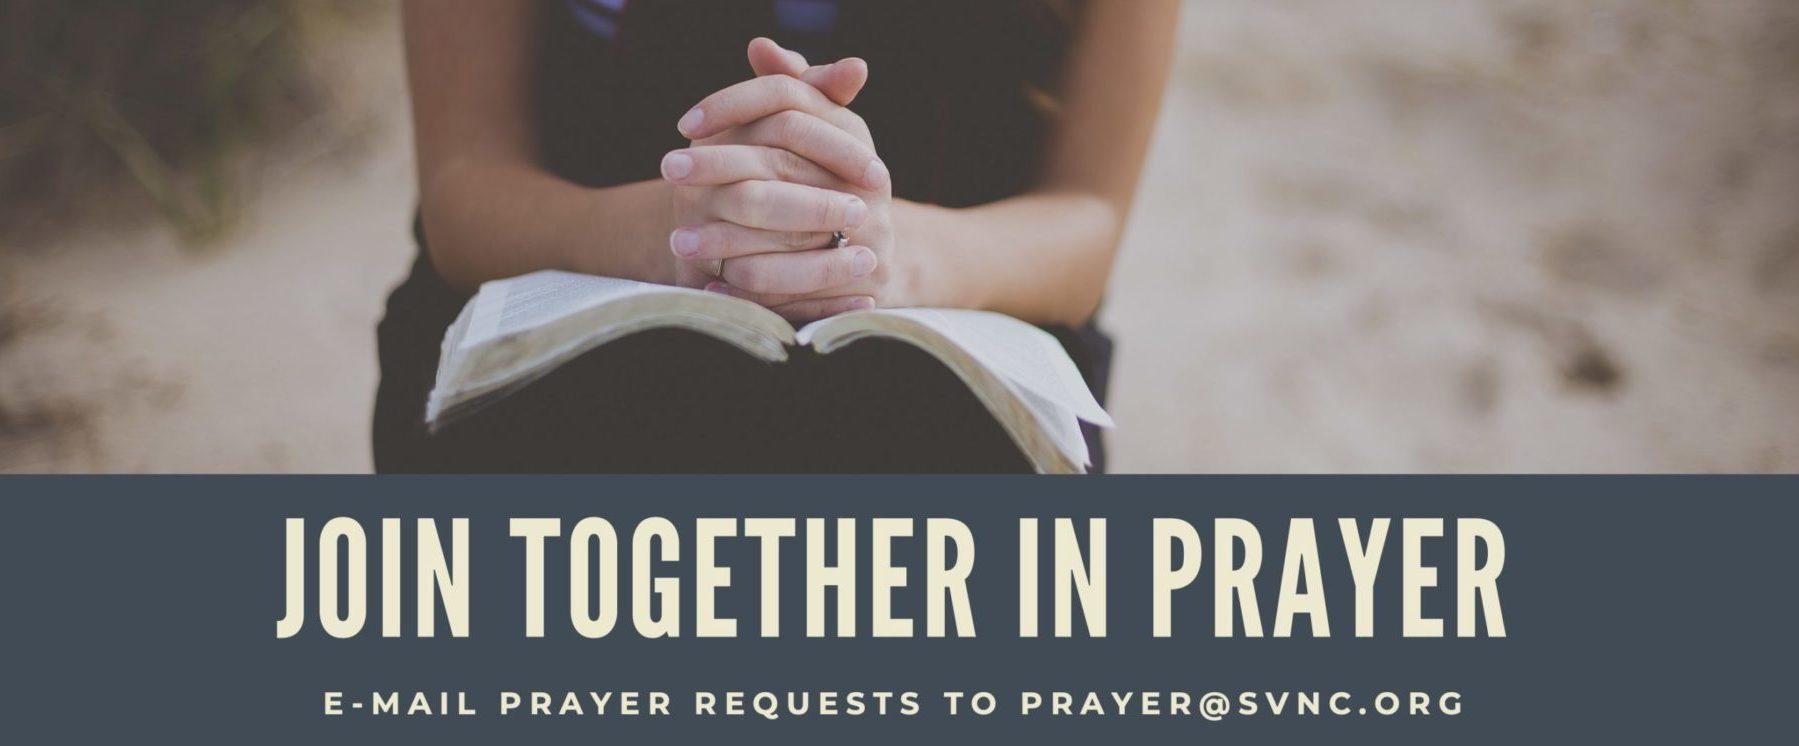 Join together in Prayer - website